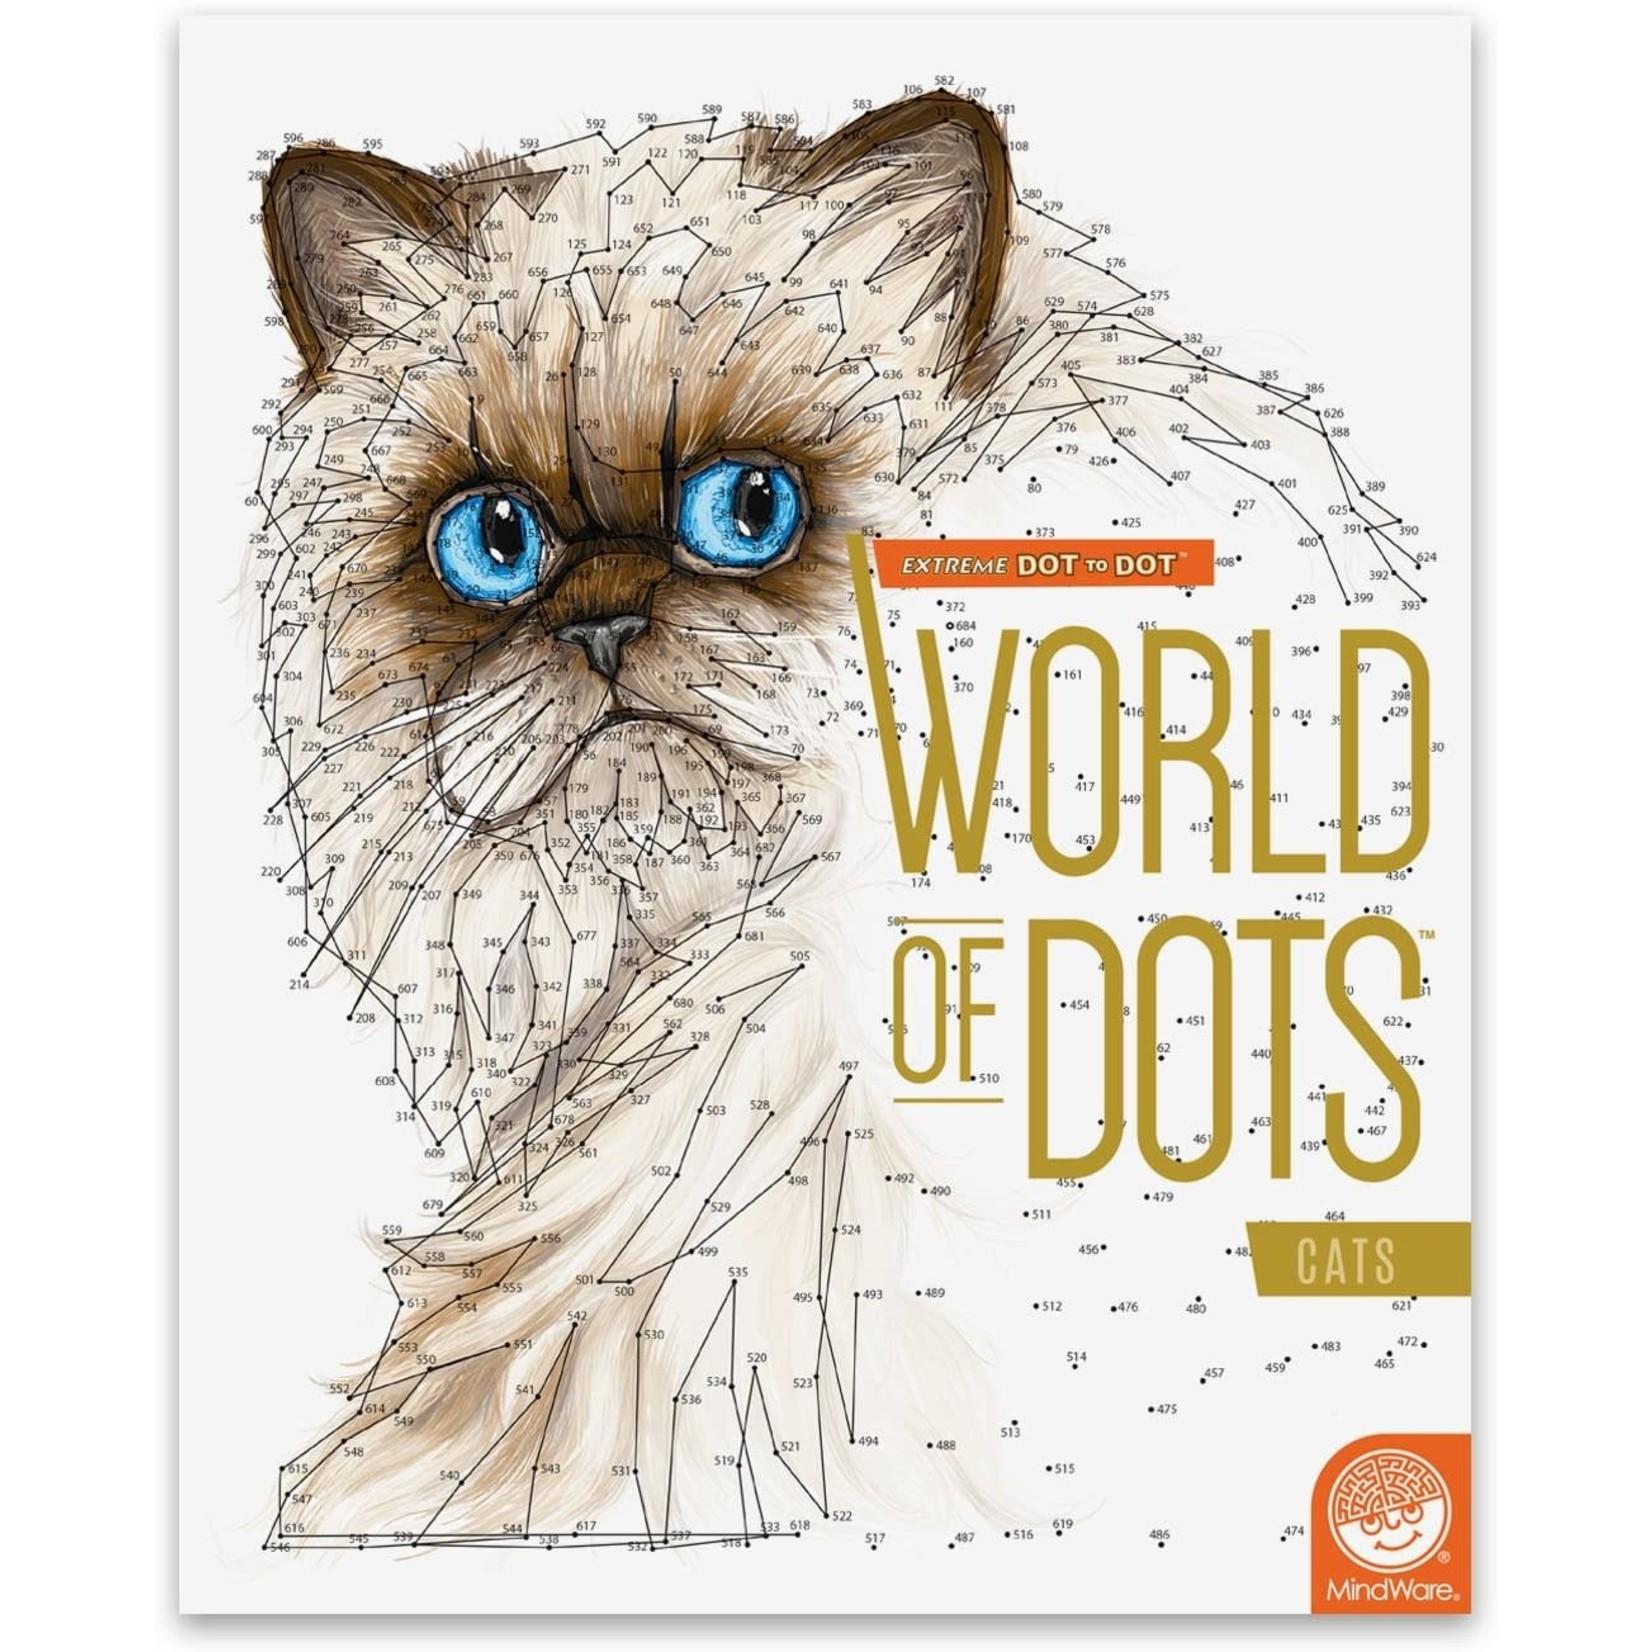 Mindware Extreme Dot to Dot Cats